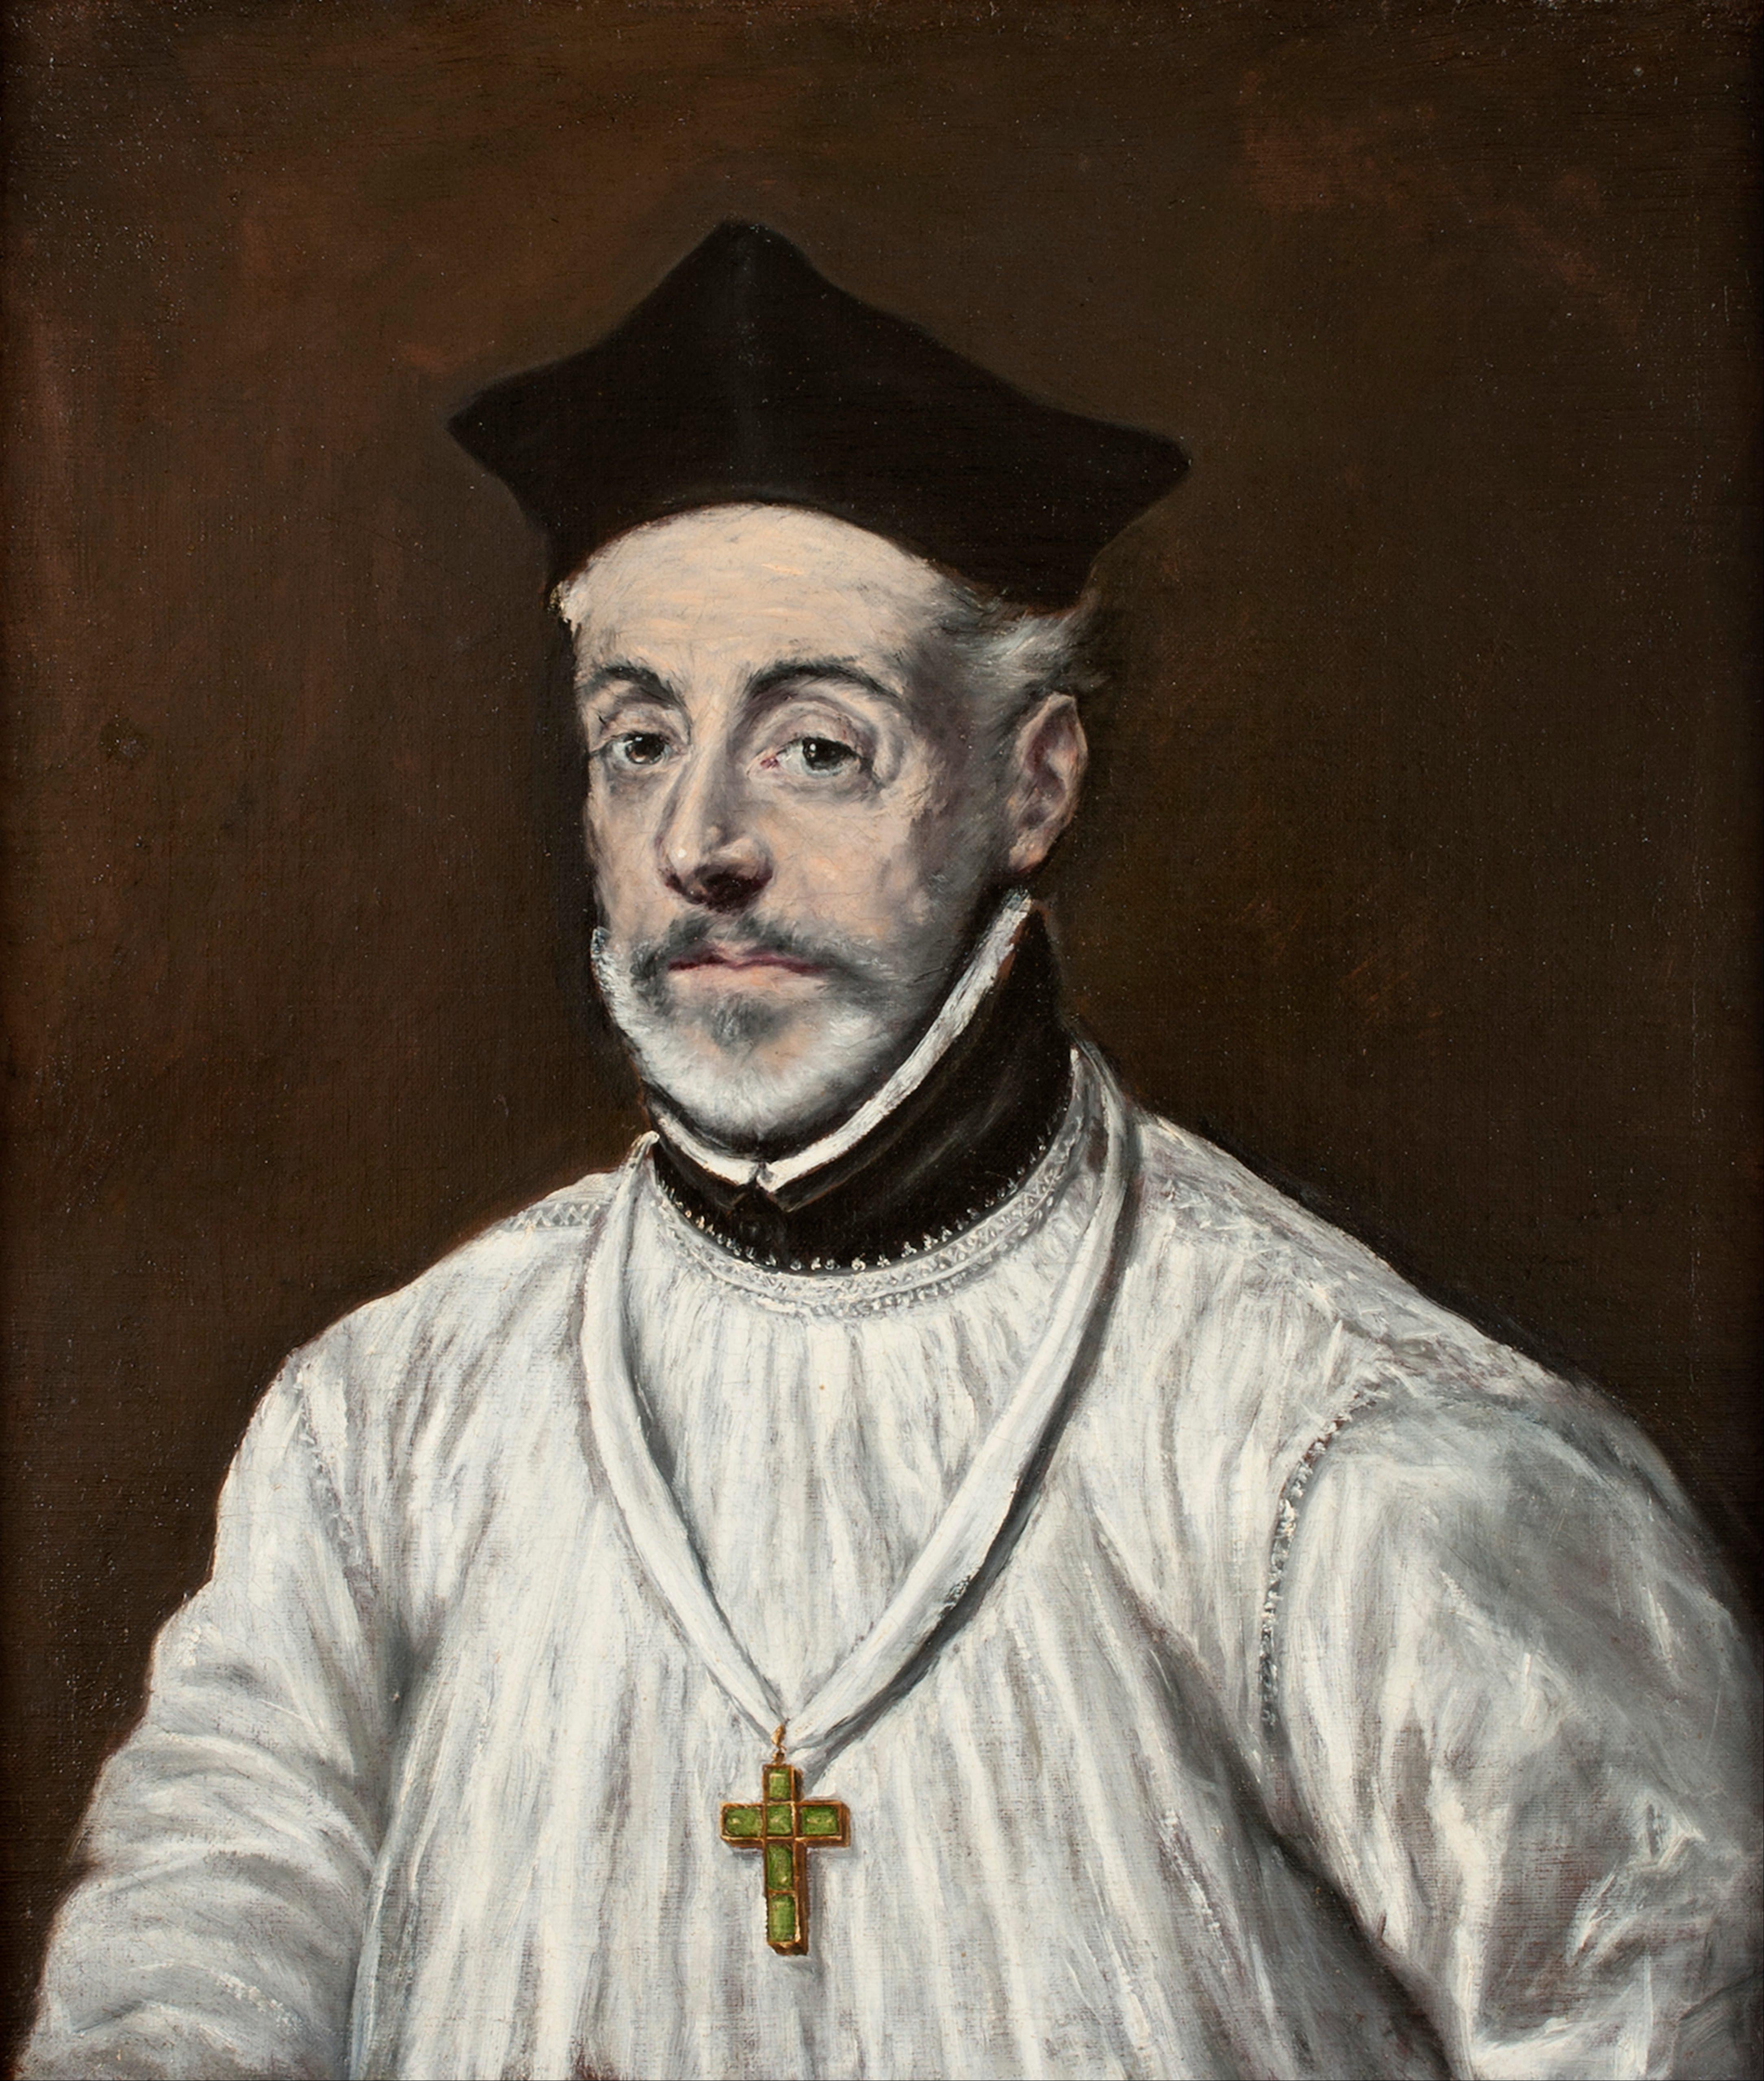 Depiction of Diego de Covarrubias